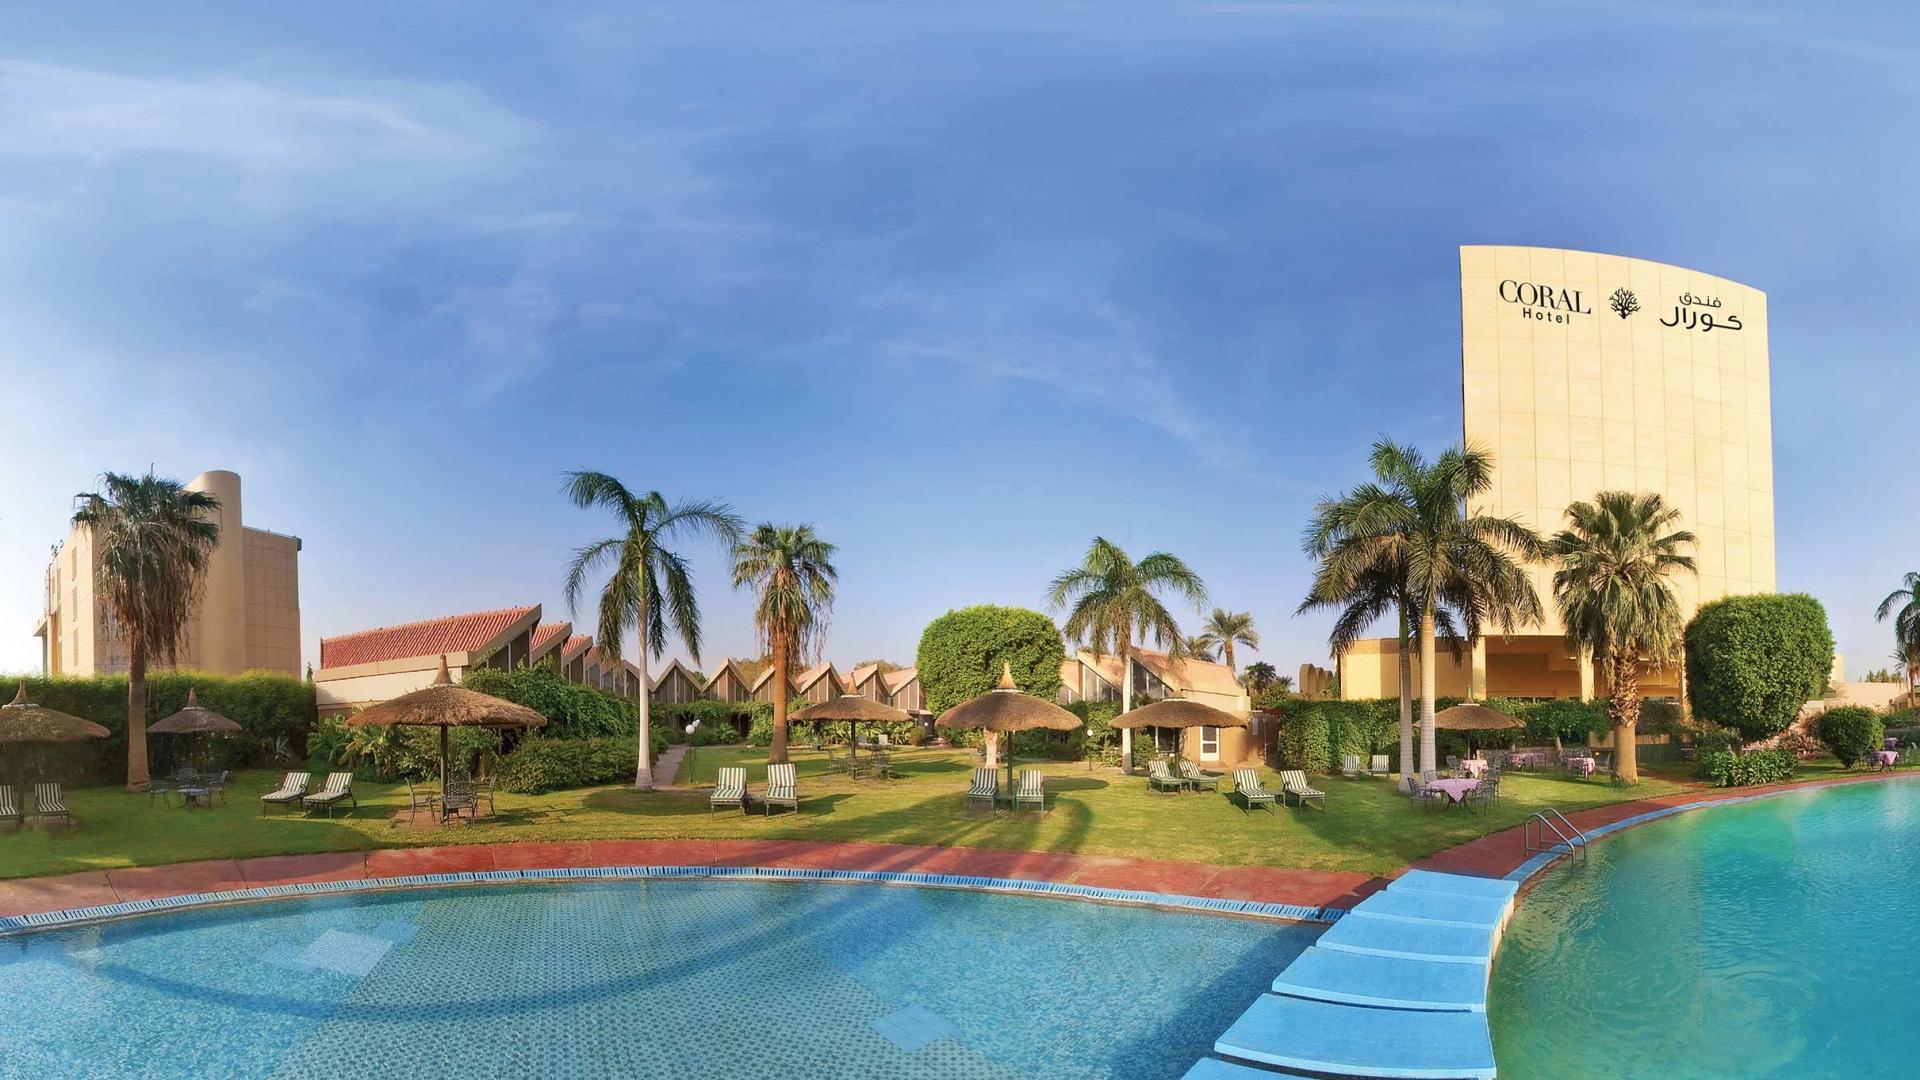 Coral Khartoum Hotel Facilities